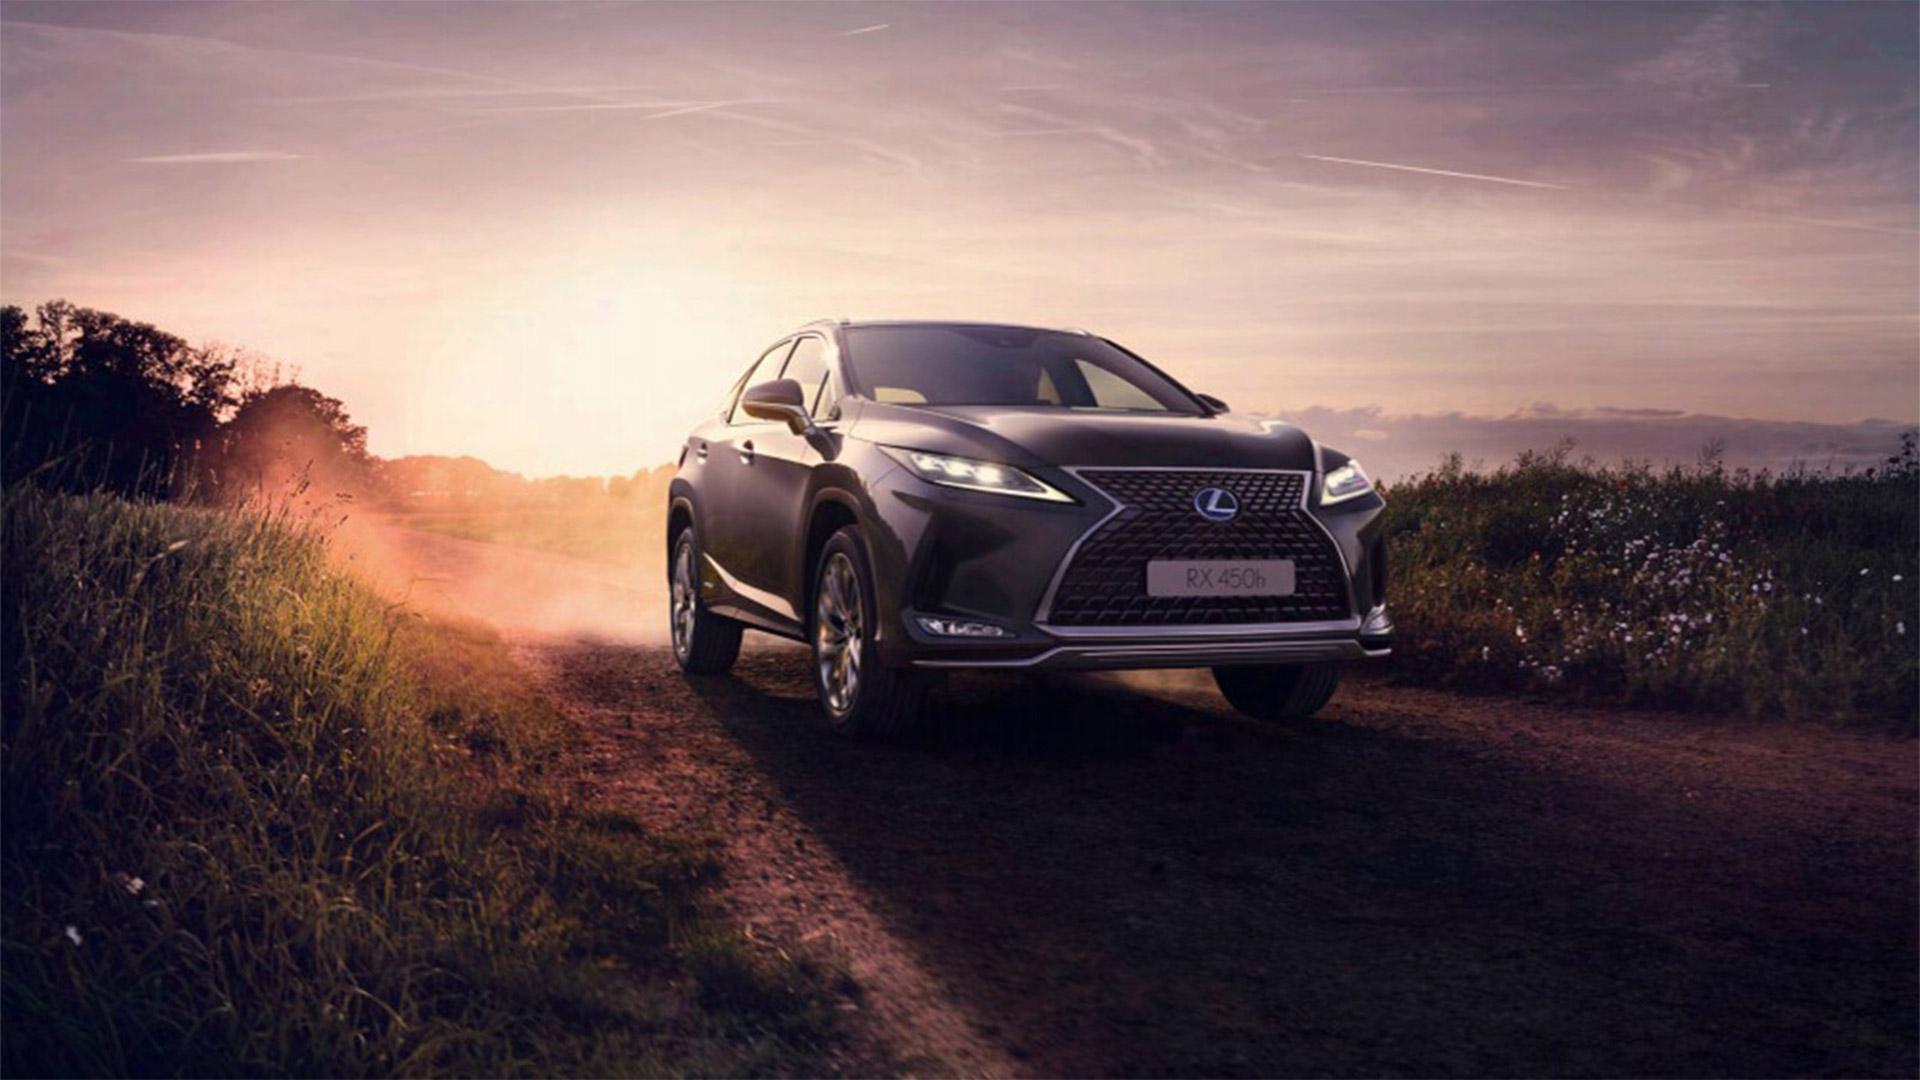 02 2019 020 Lexus RX pionier 1920x1080 galerij